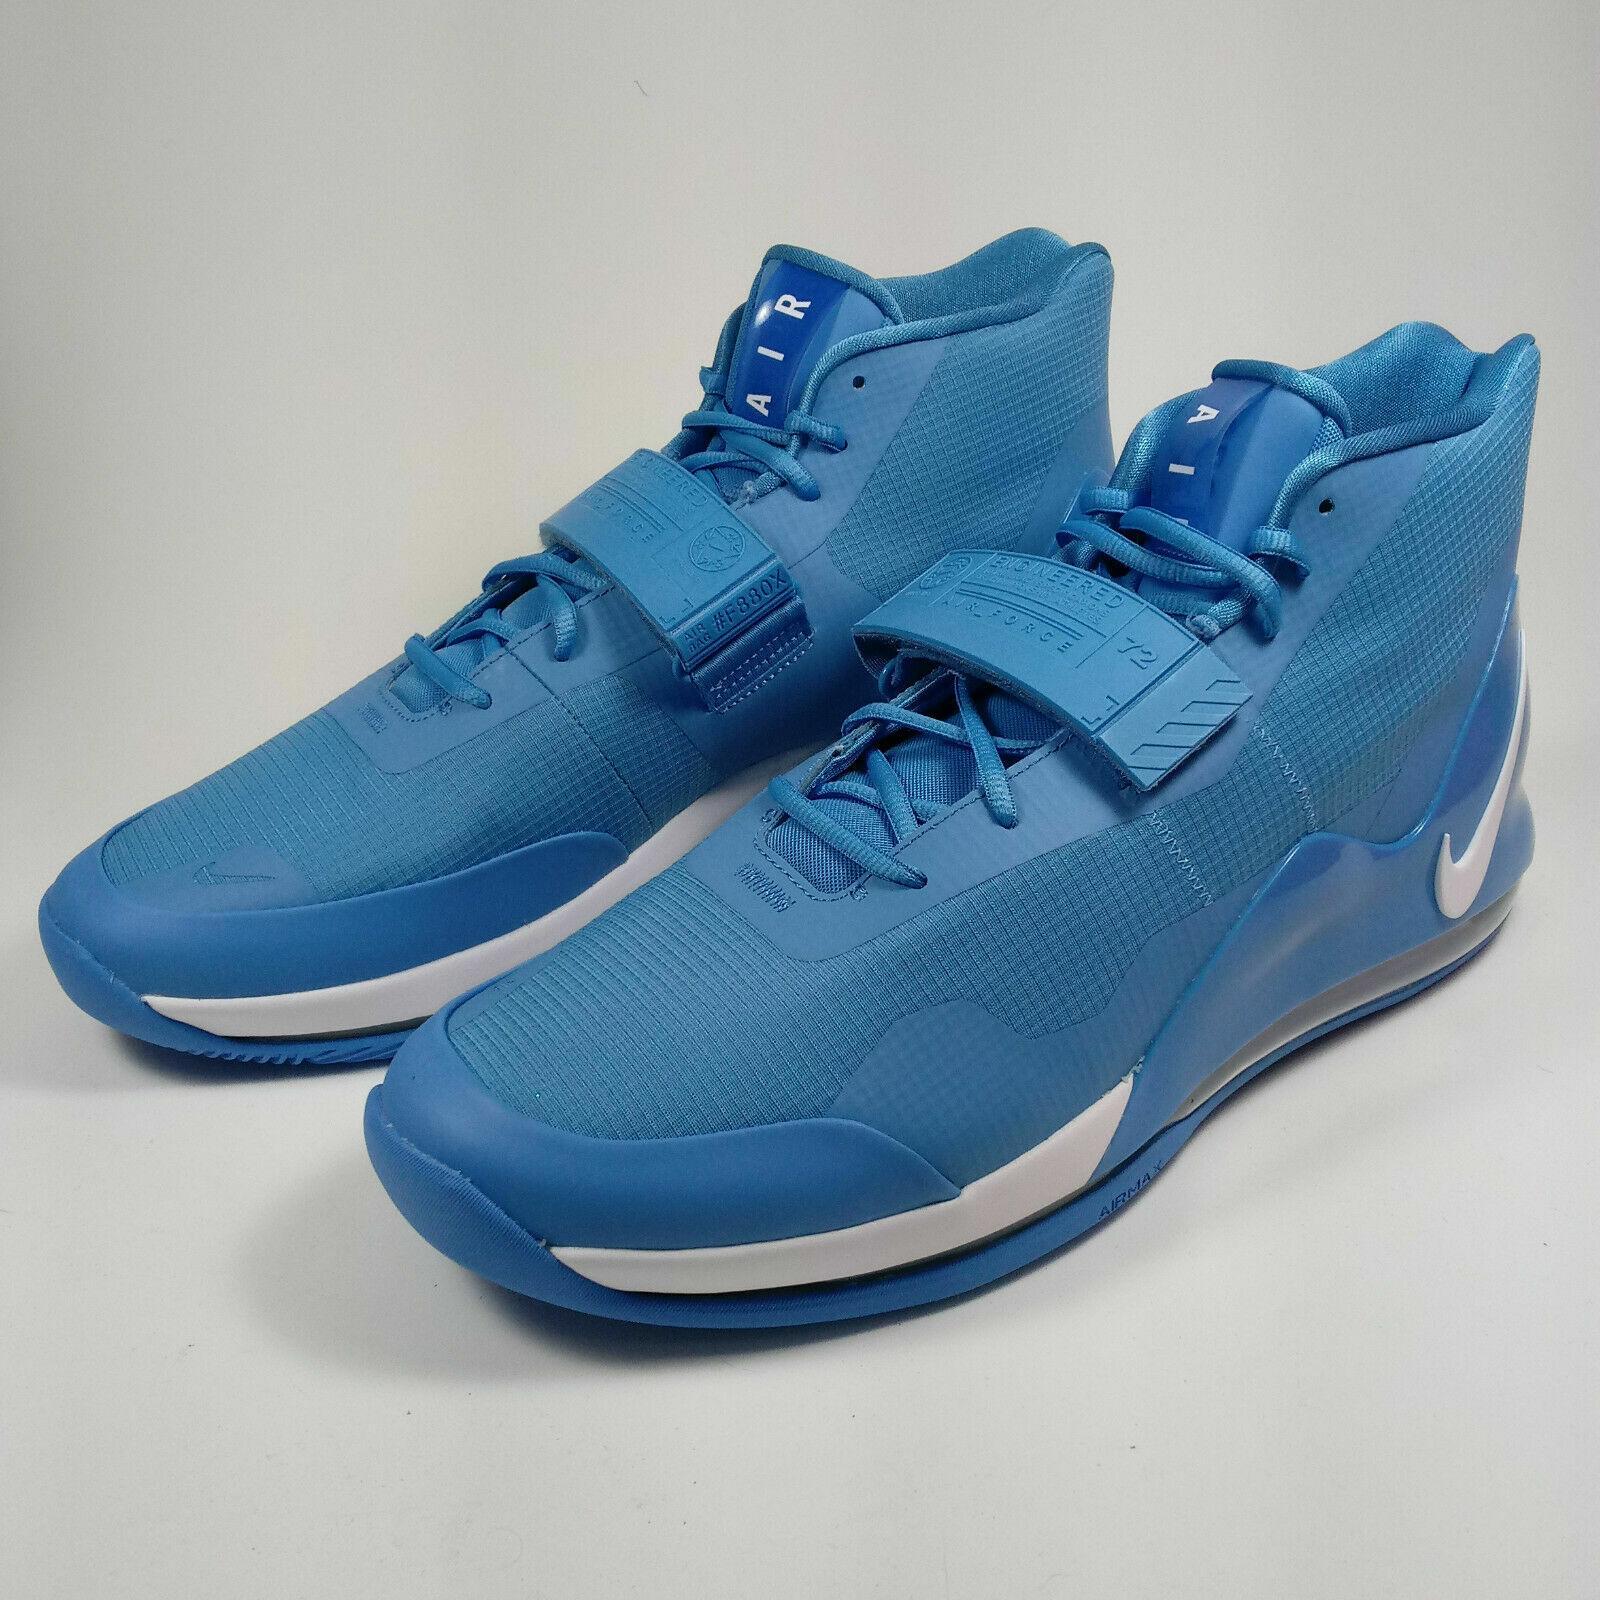 Nike Air Force Max '19 Basket Uomo Scarpe Blu (AR4095 400